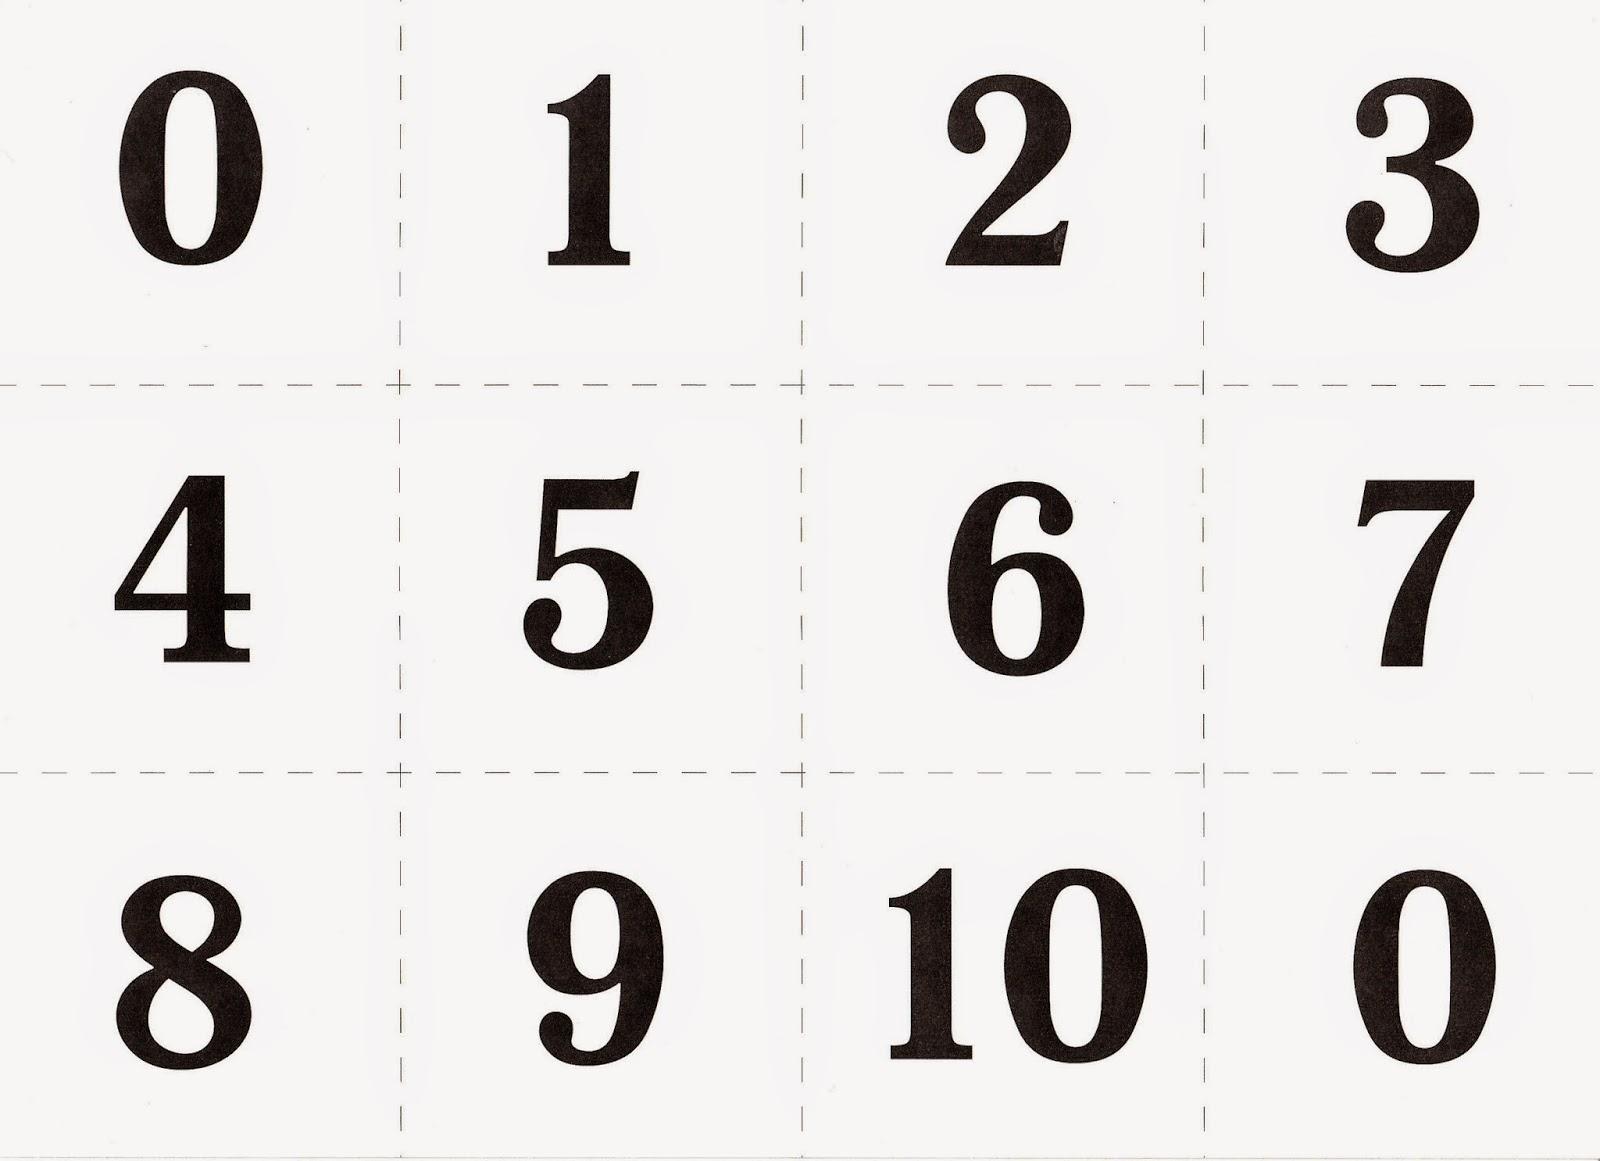 загадки с цифрой 9 на что похожа цифра эта